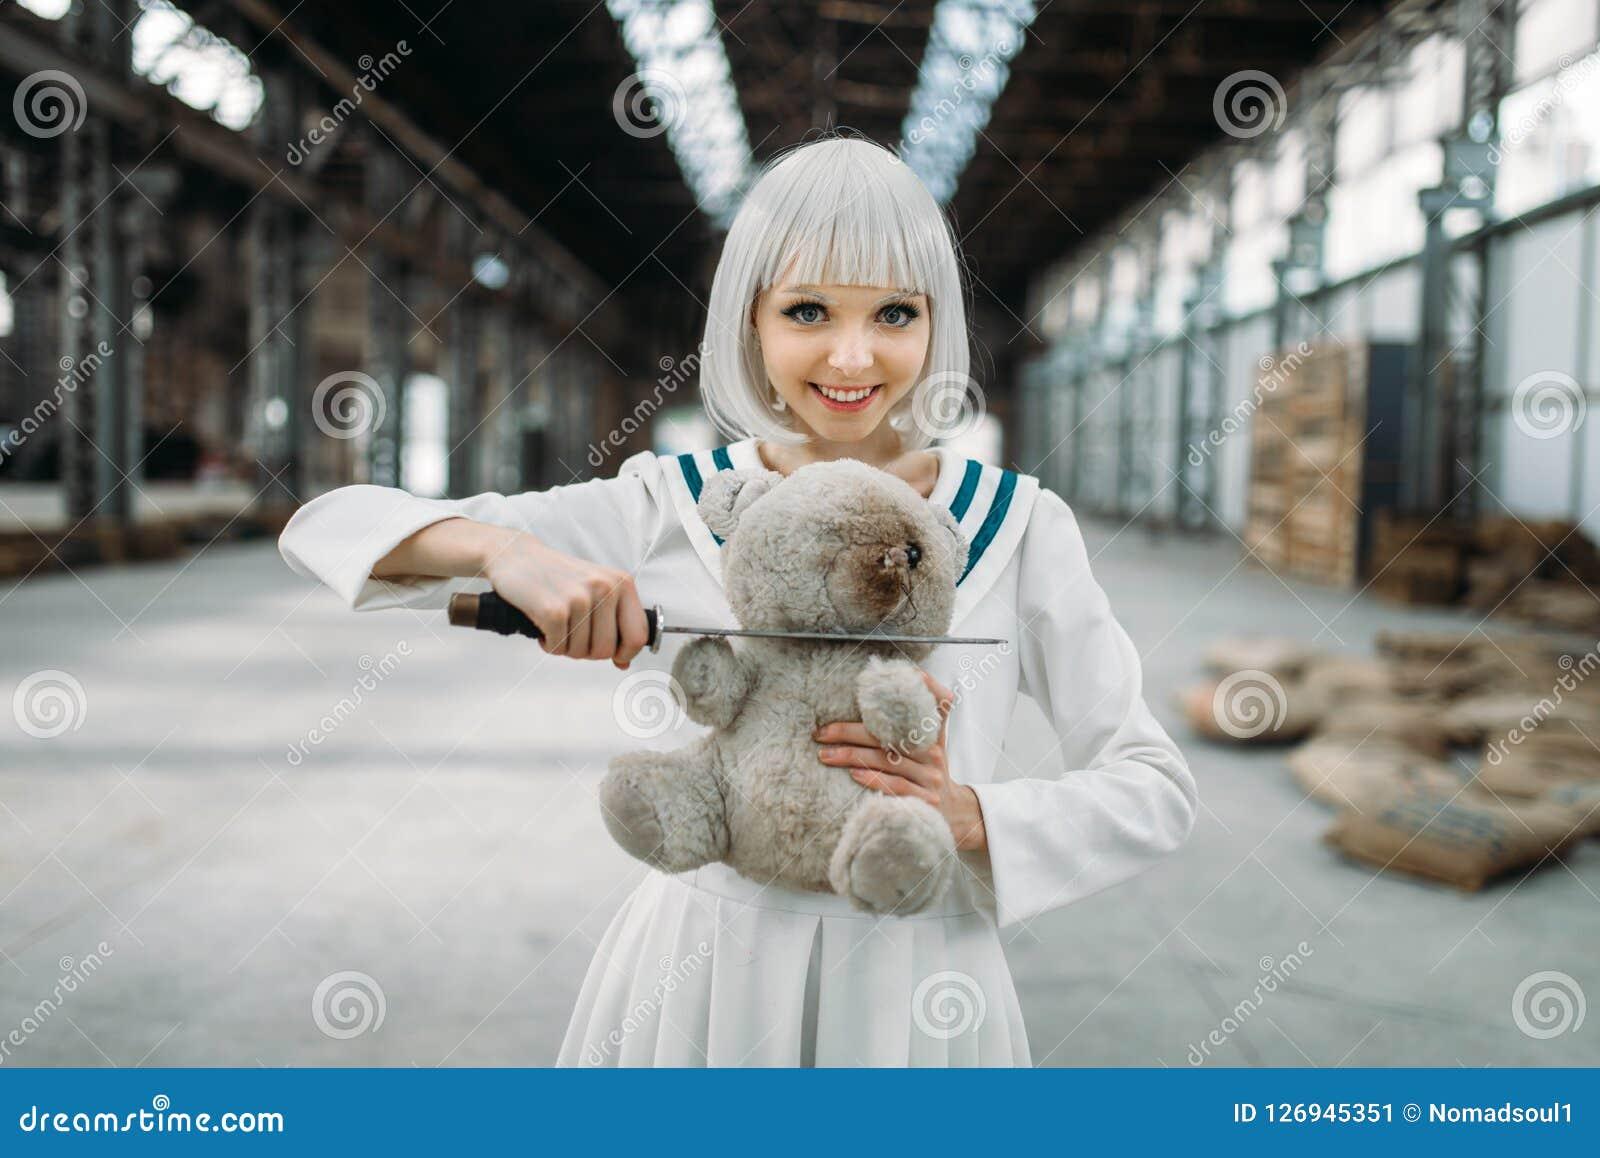 Anime style lady cuts off the head of a teddy bear